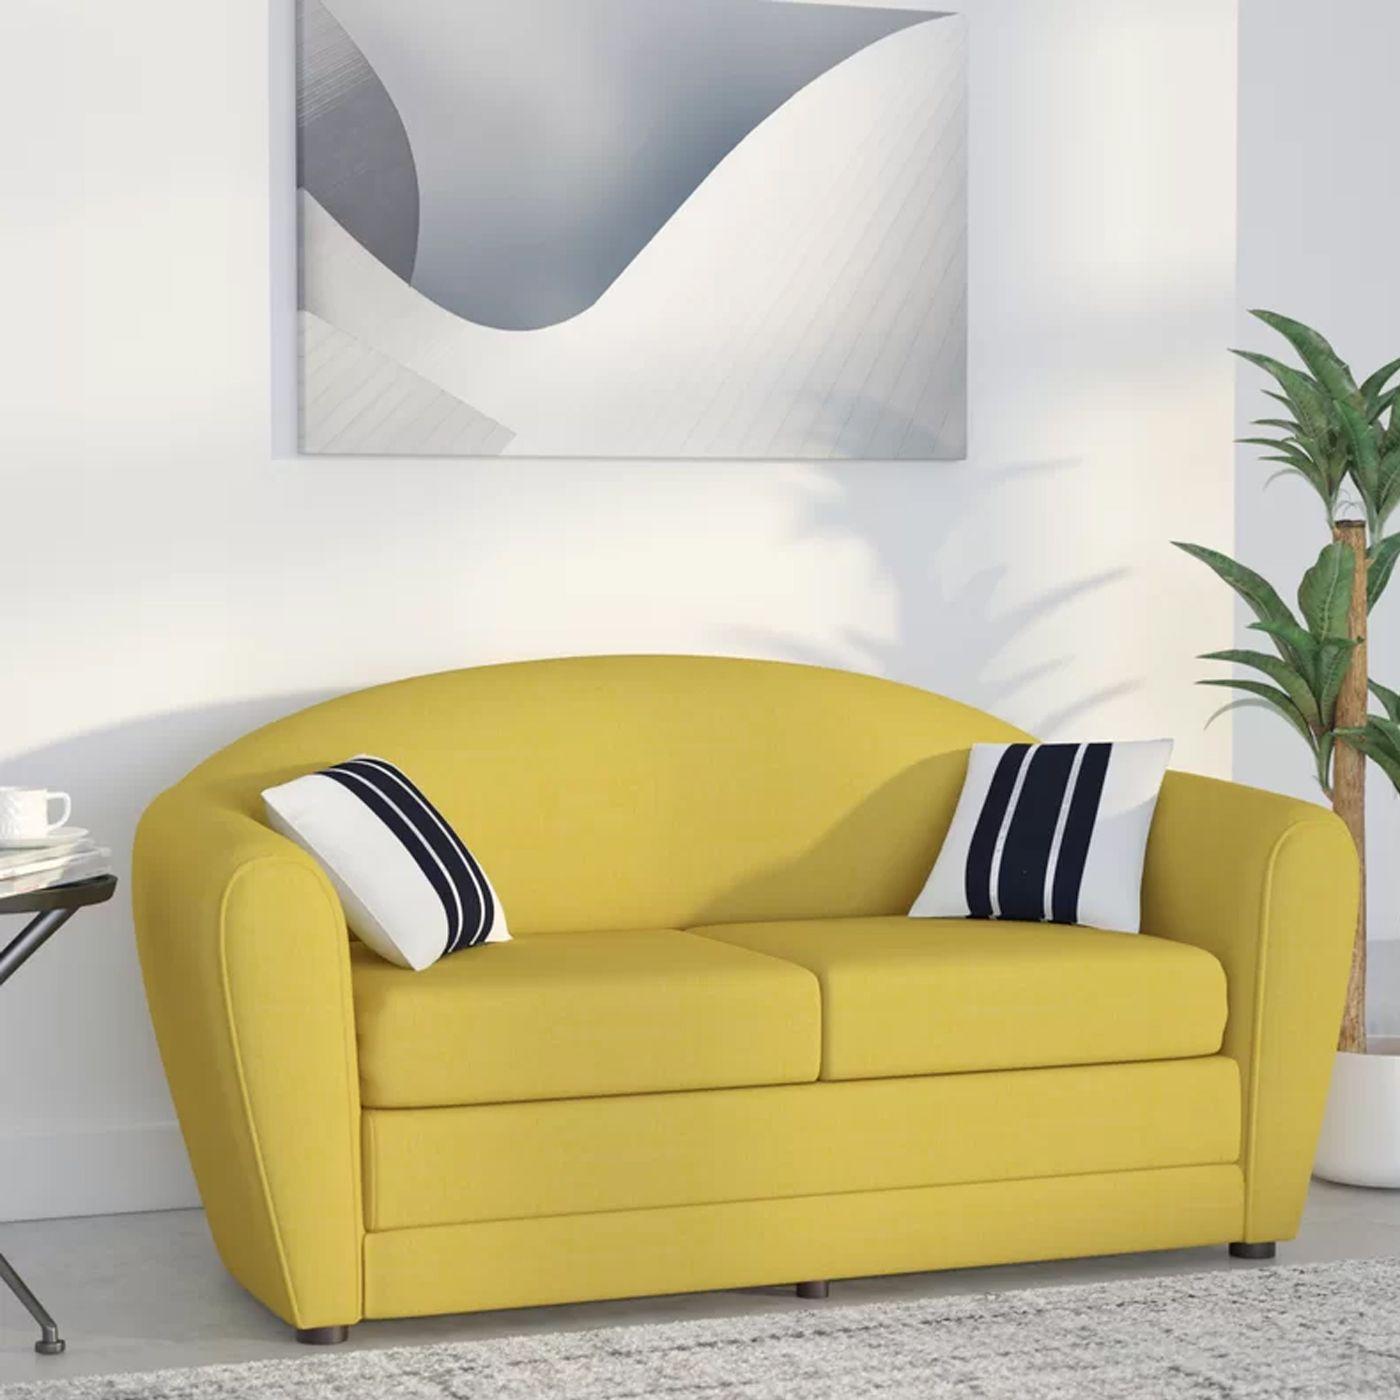 Pin by Stylecrome on Sofa Loveseat sleeper, Love seat